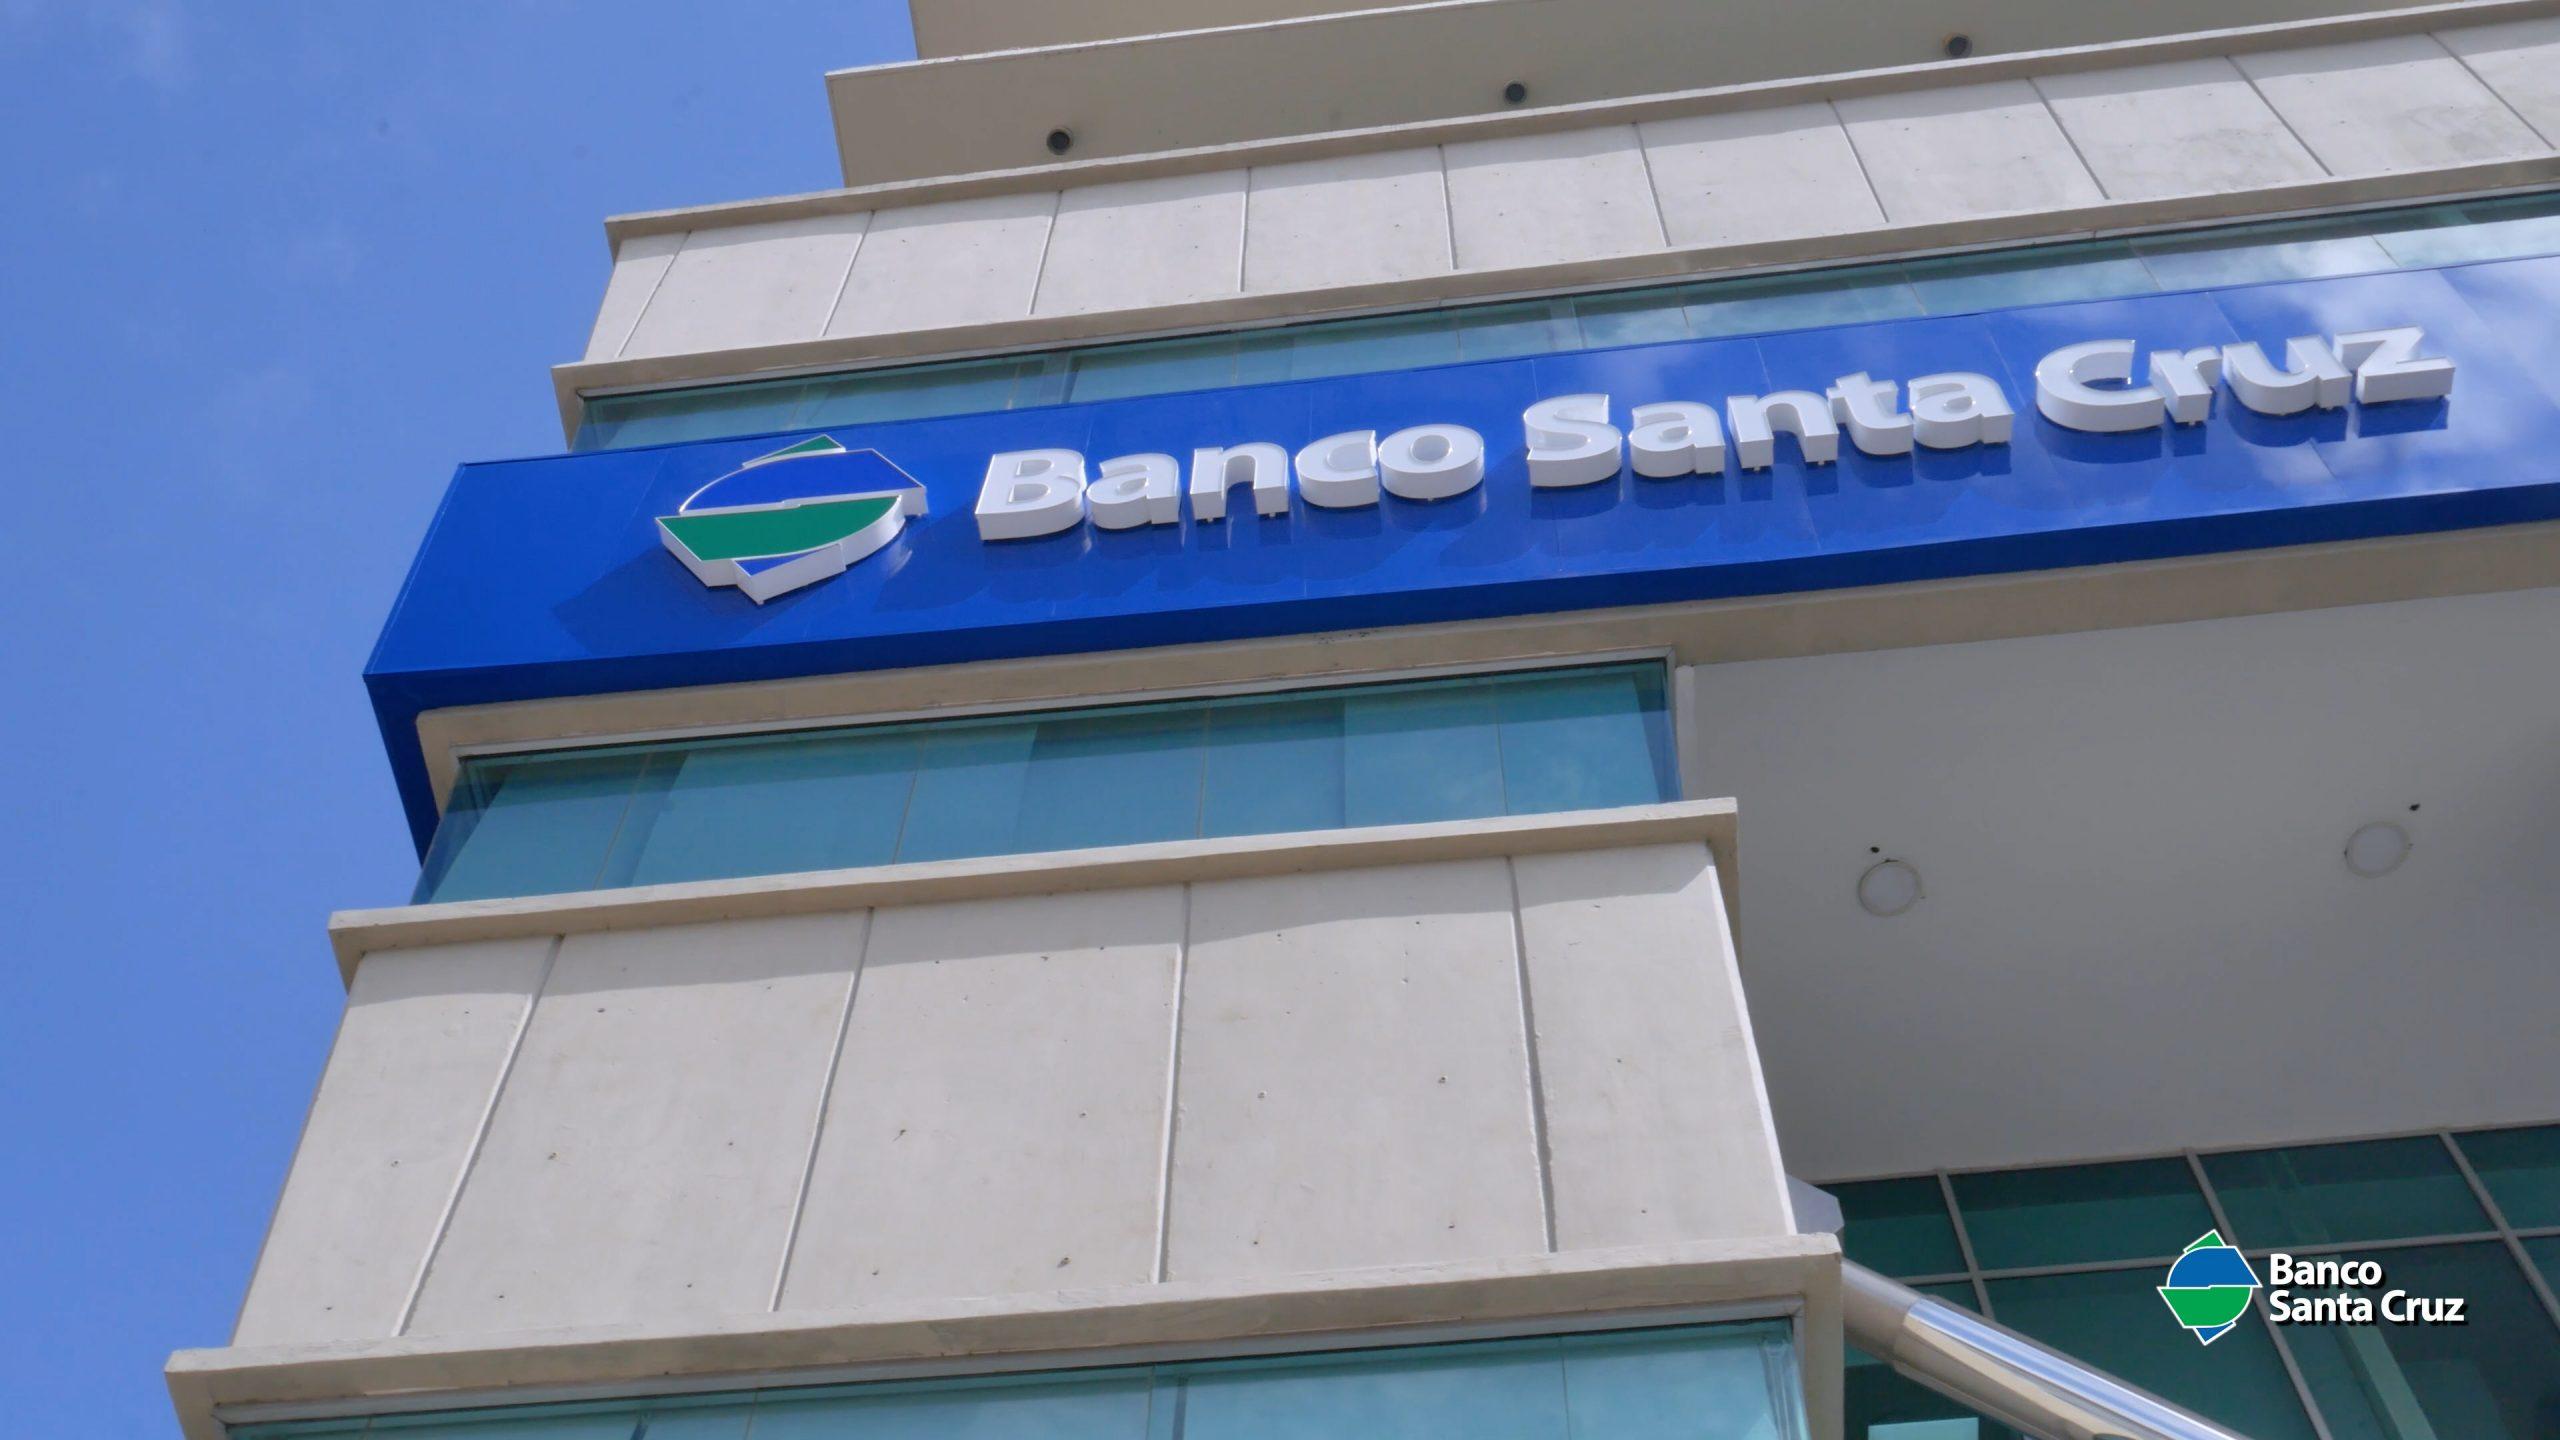 cápsula banco santa cruz 4k.00 00 28 15.still004